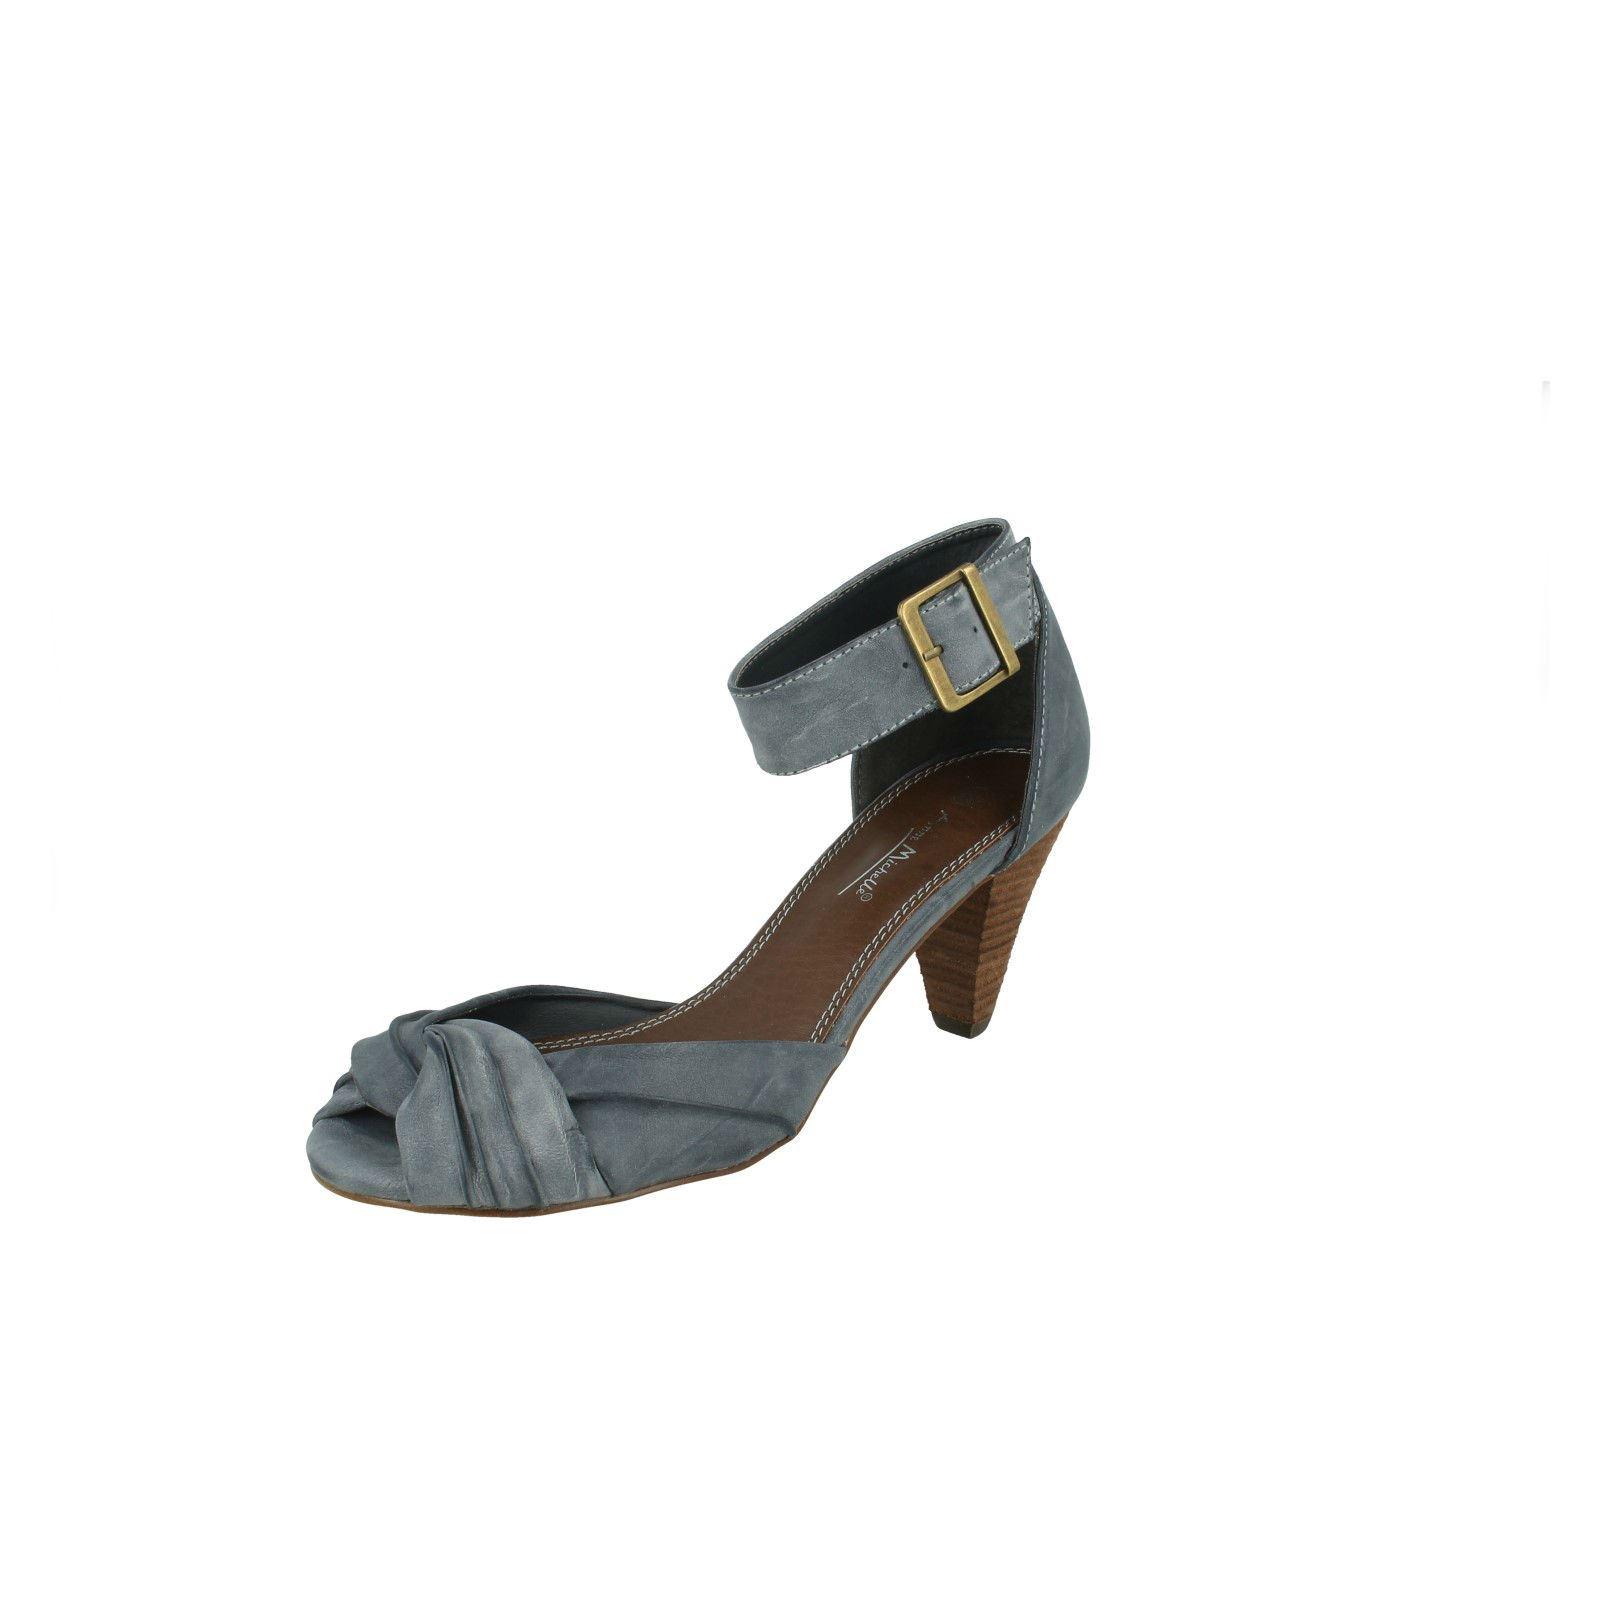 Damas Anne Michelle Tribunal Zapatos el estilo-L3959